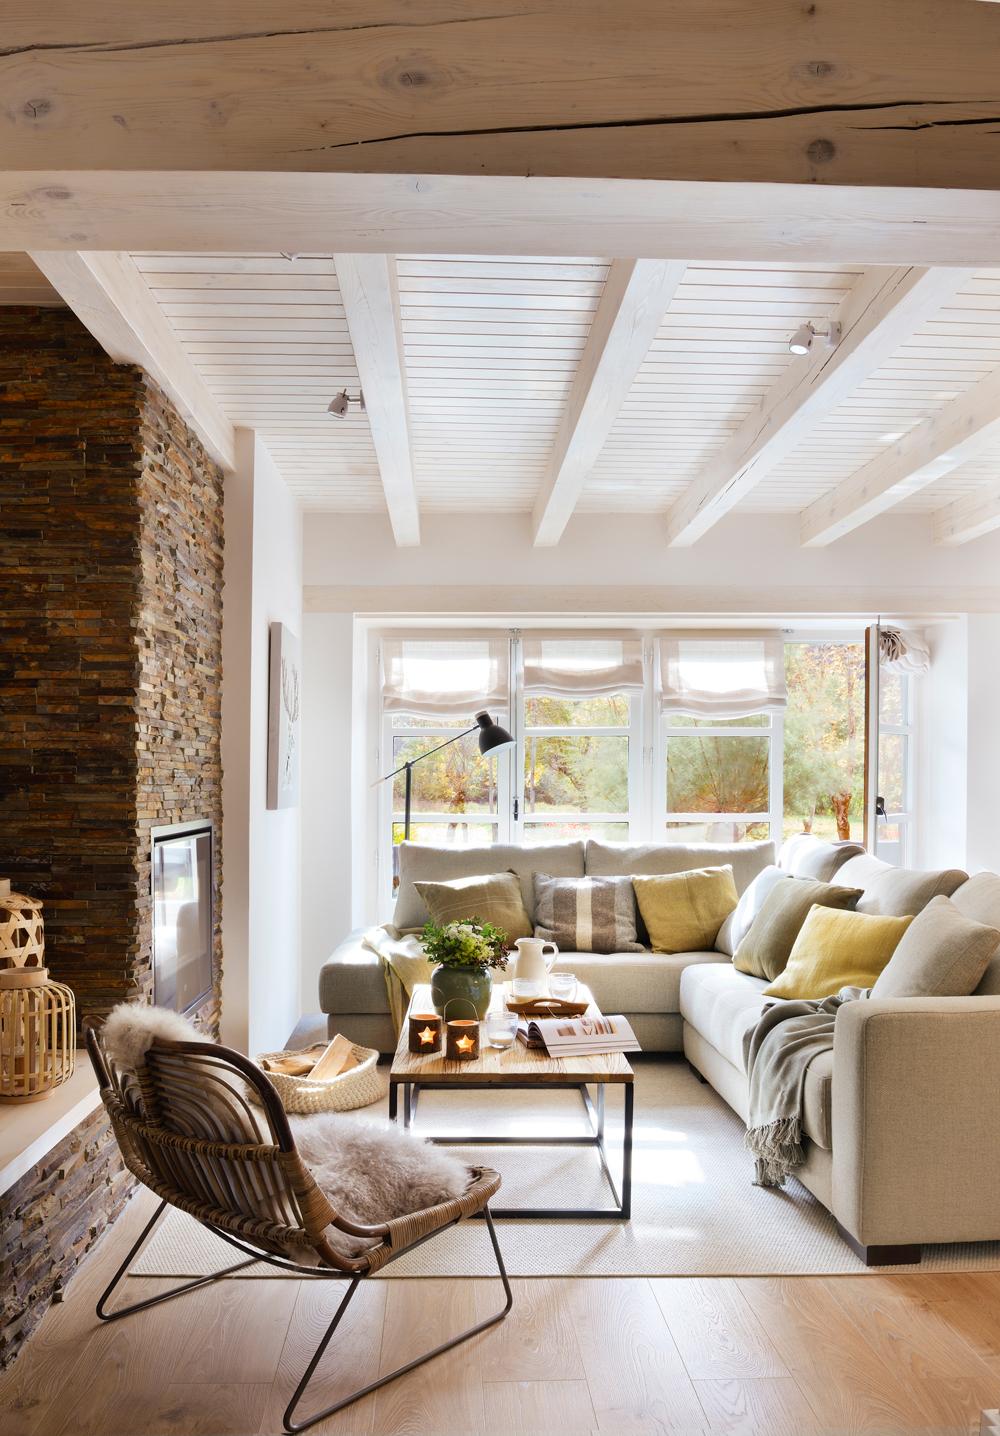 Salones peque os con muebles que aprovechan cada cent metro - Colores grises para salones ...